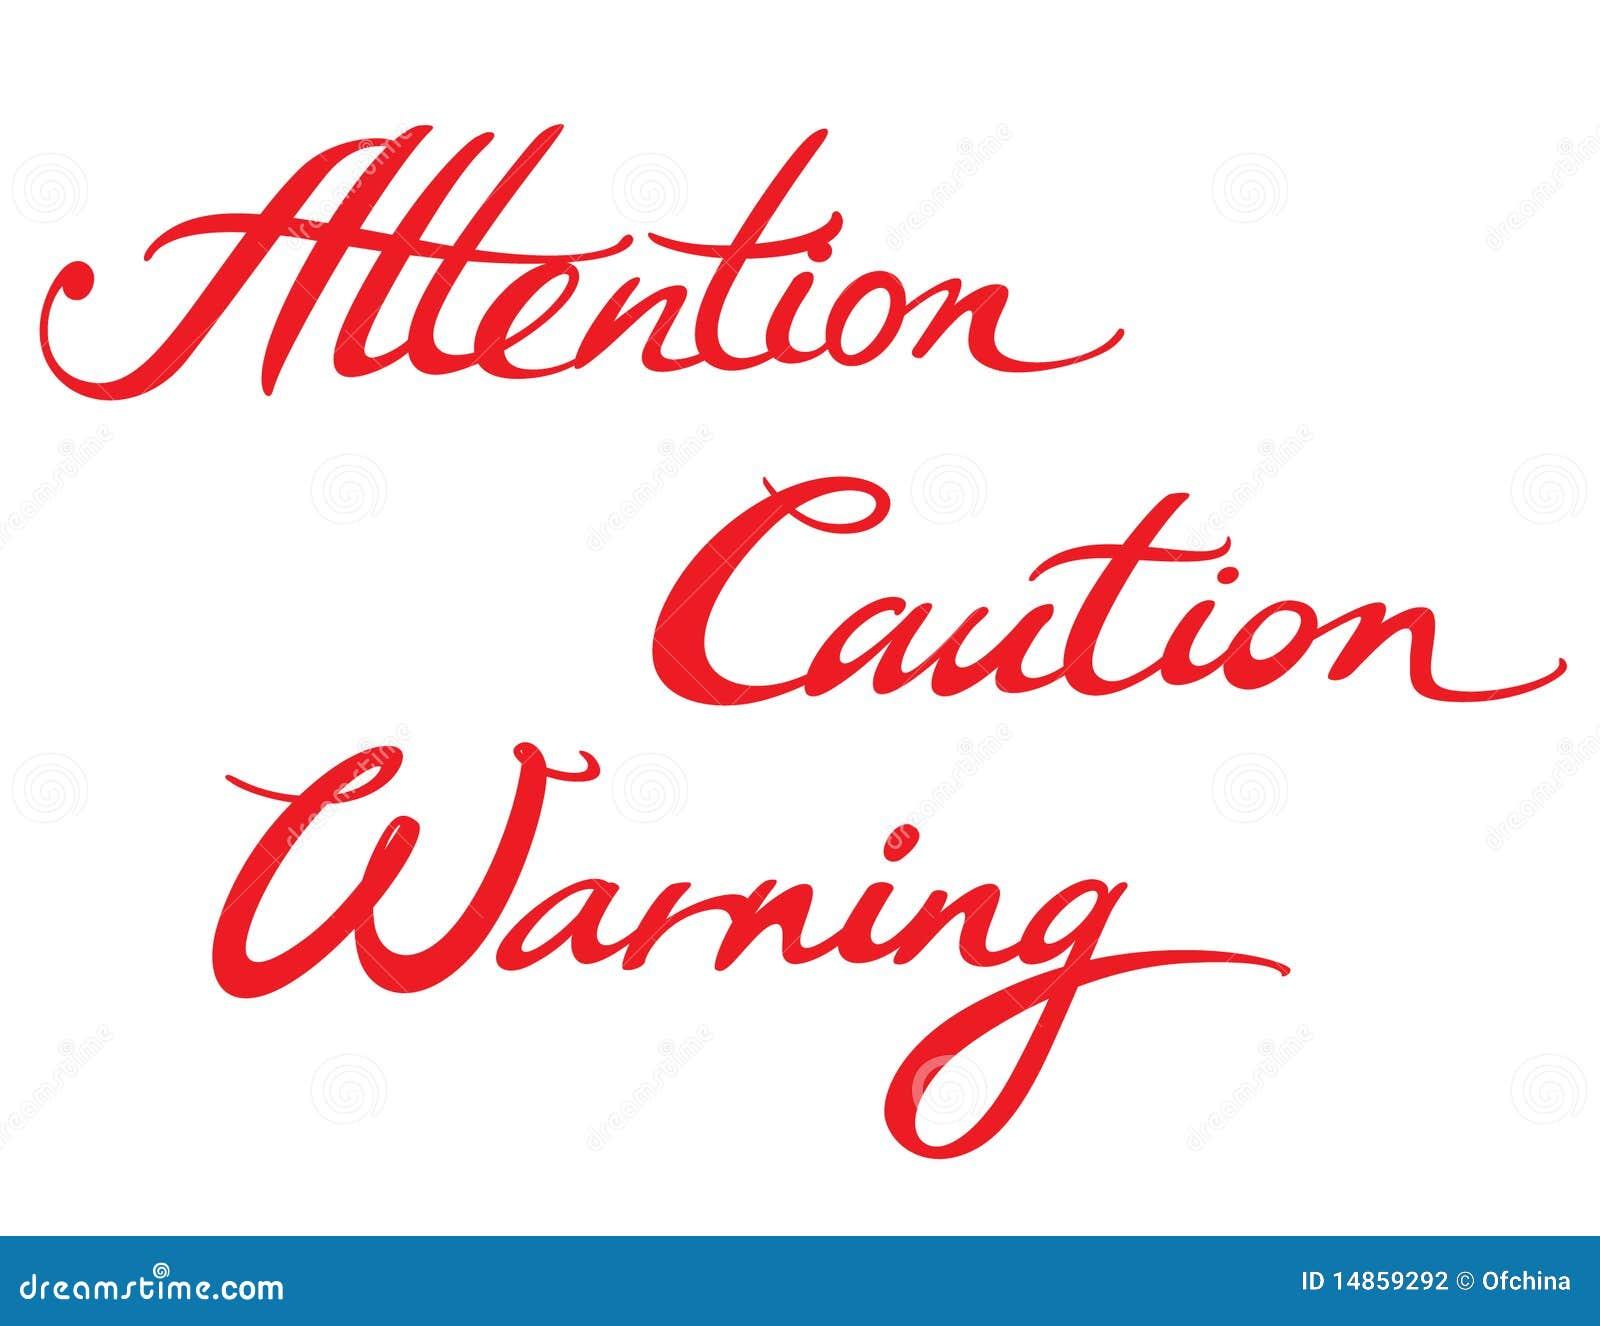 Attention Caution Warning